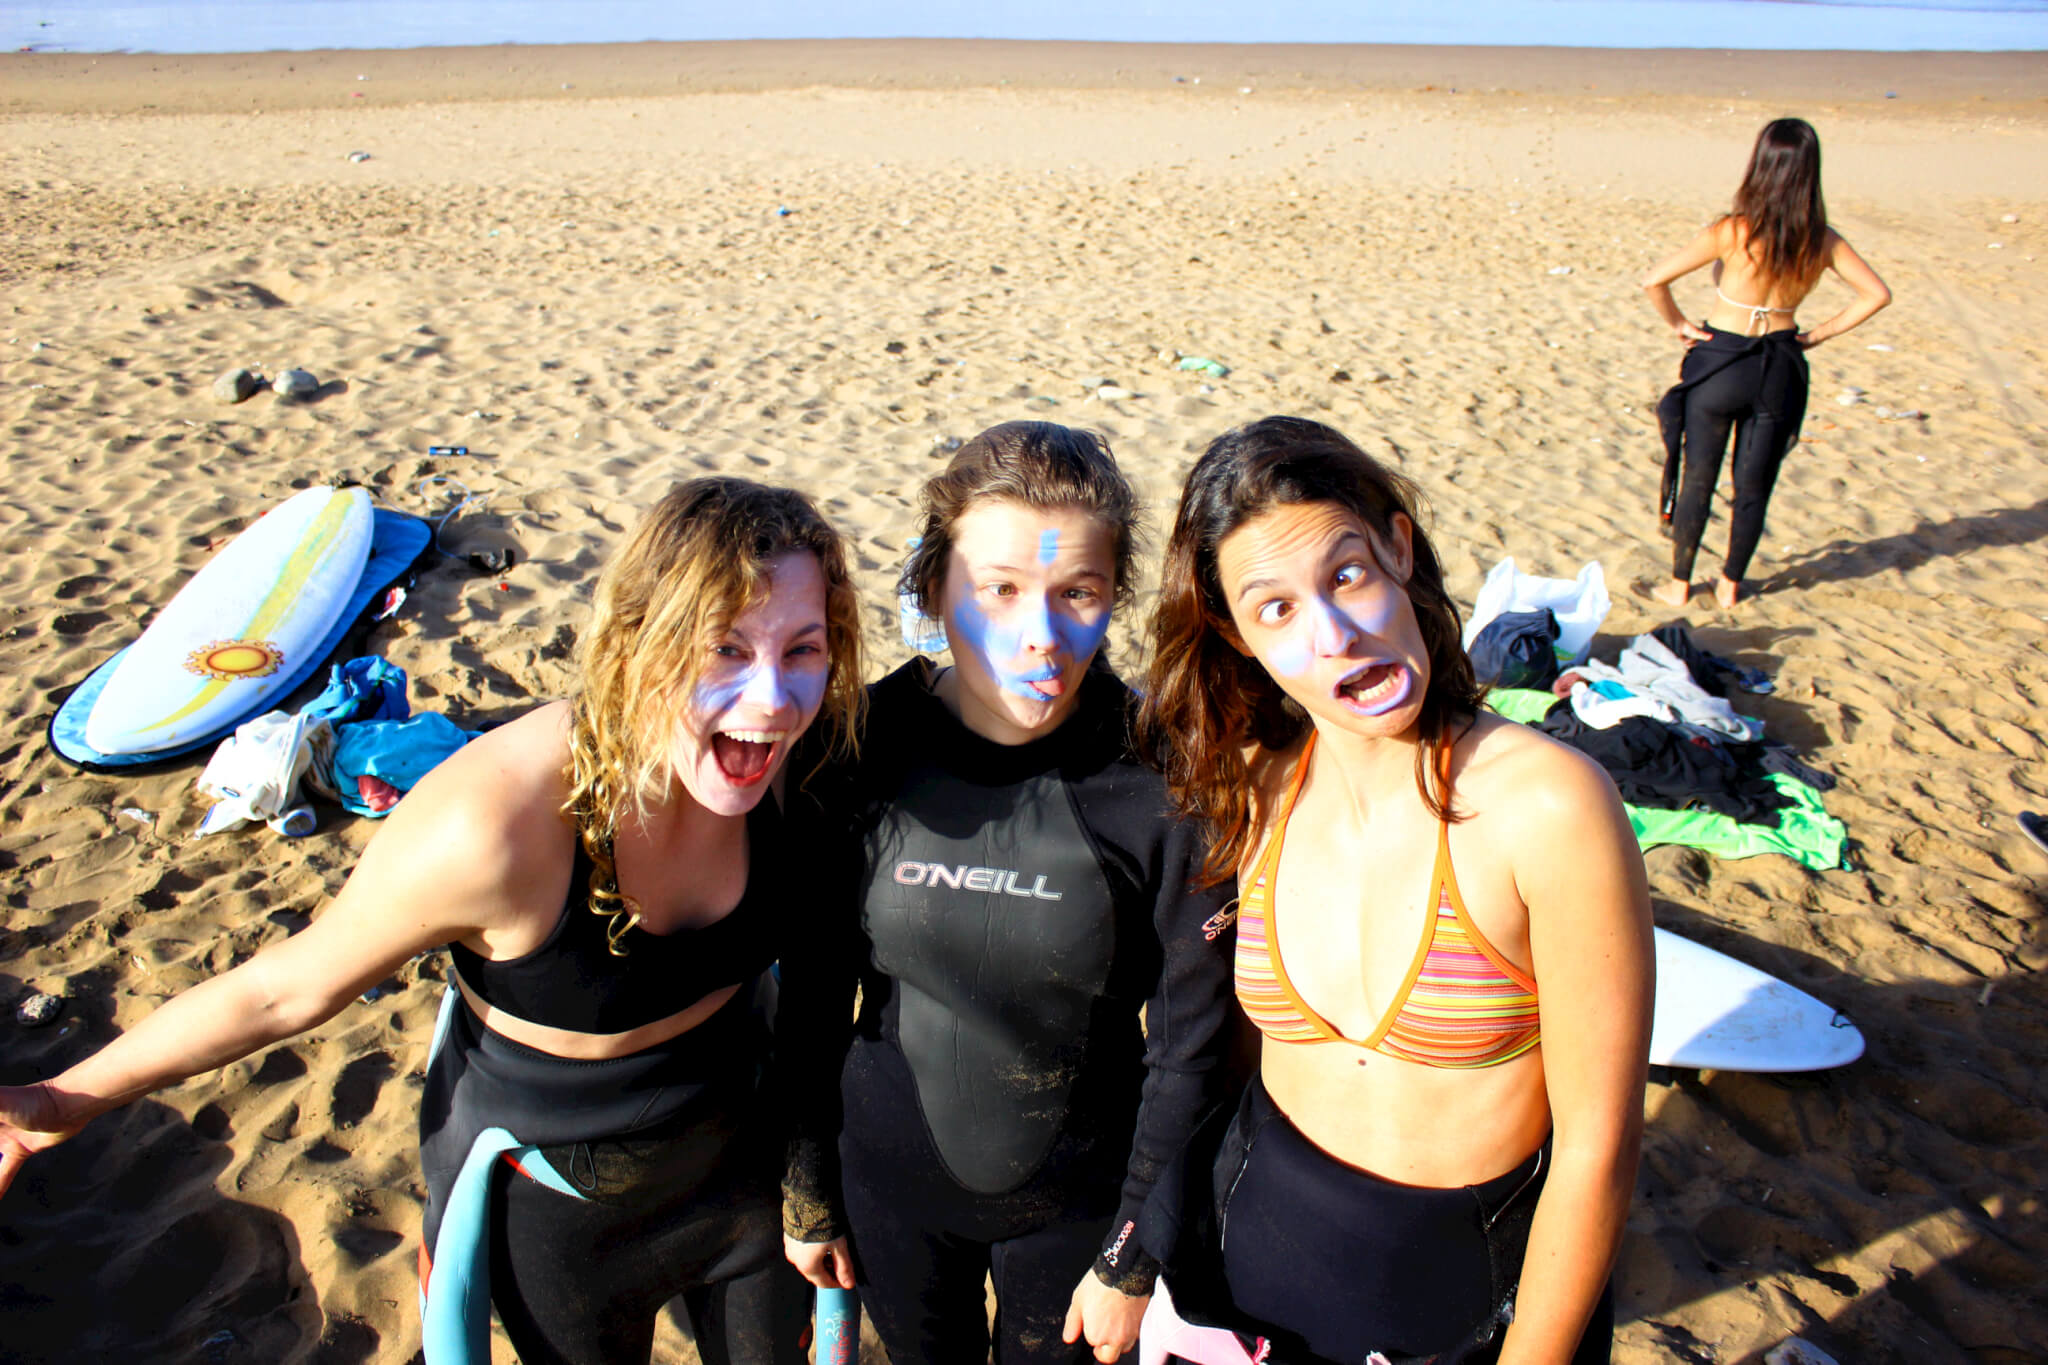 Solid Surf House - friendship - zink - fun - surfclass - beach